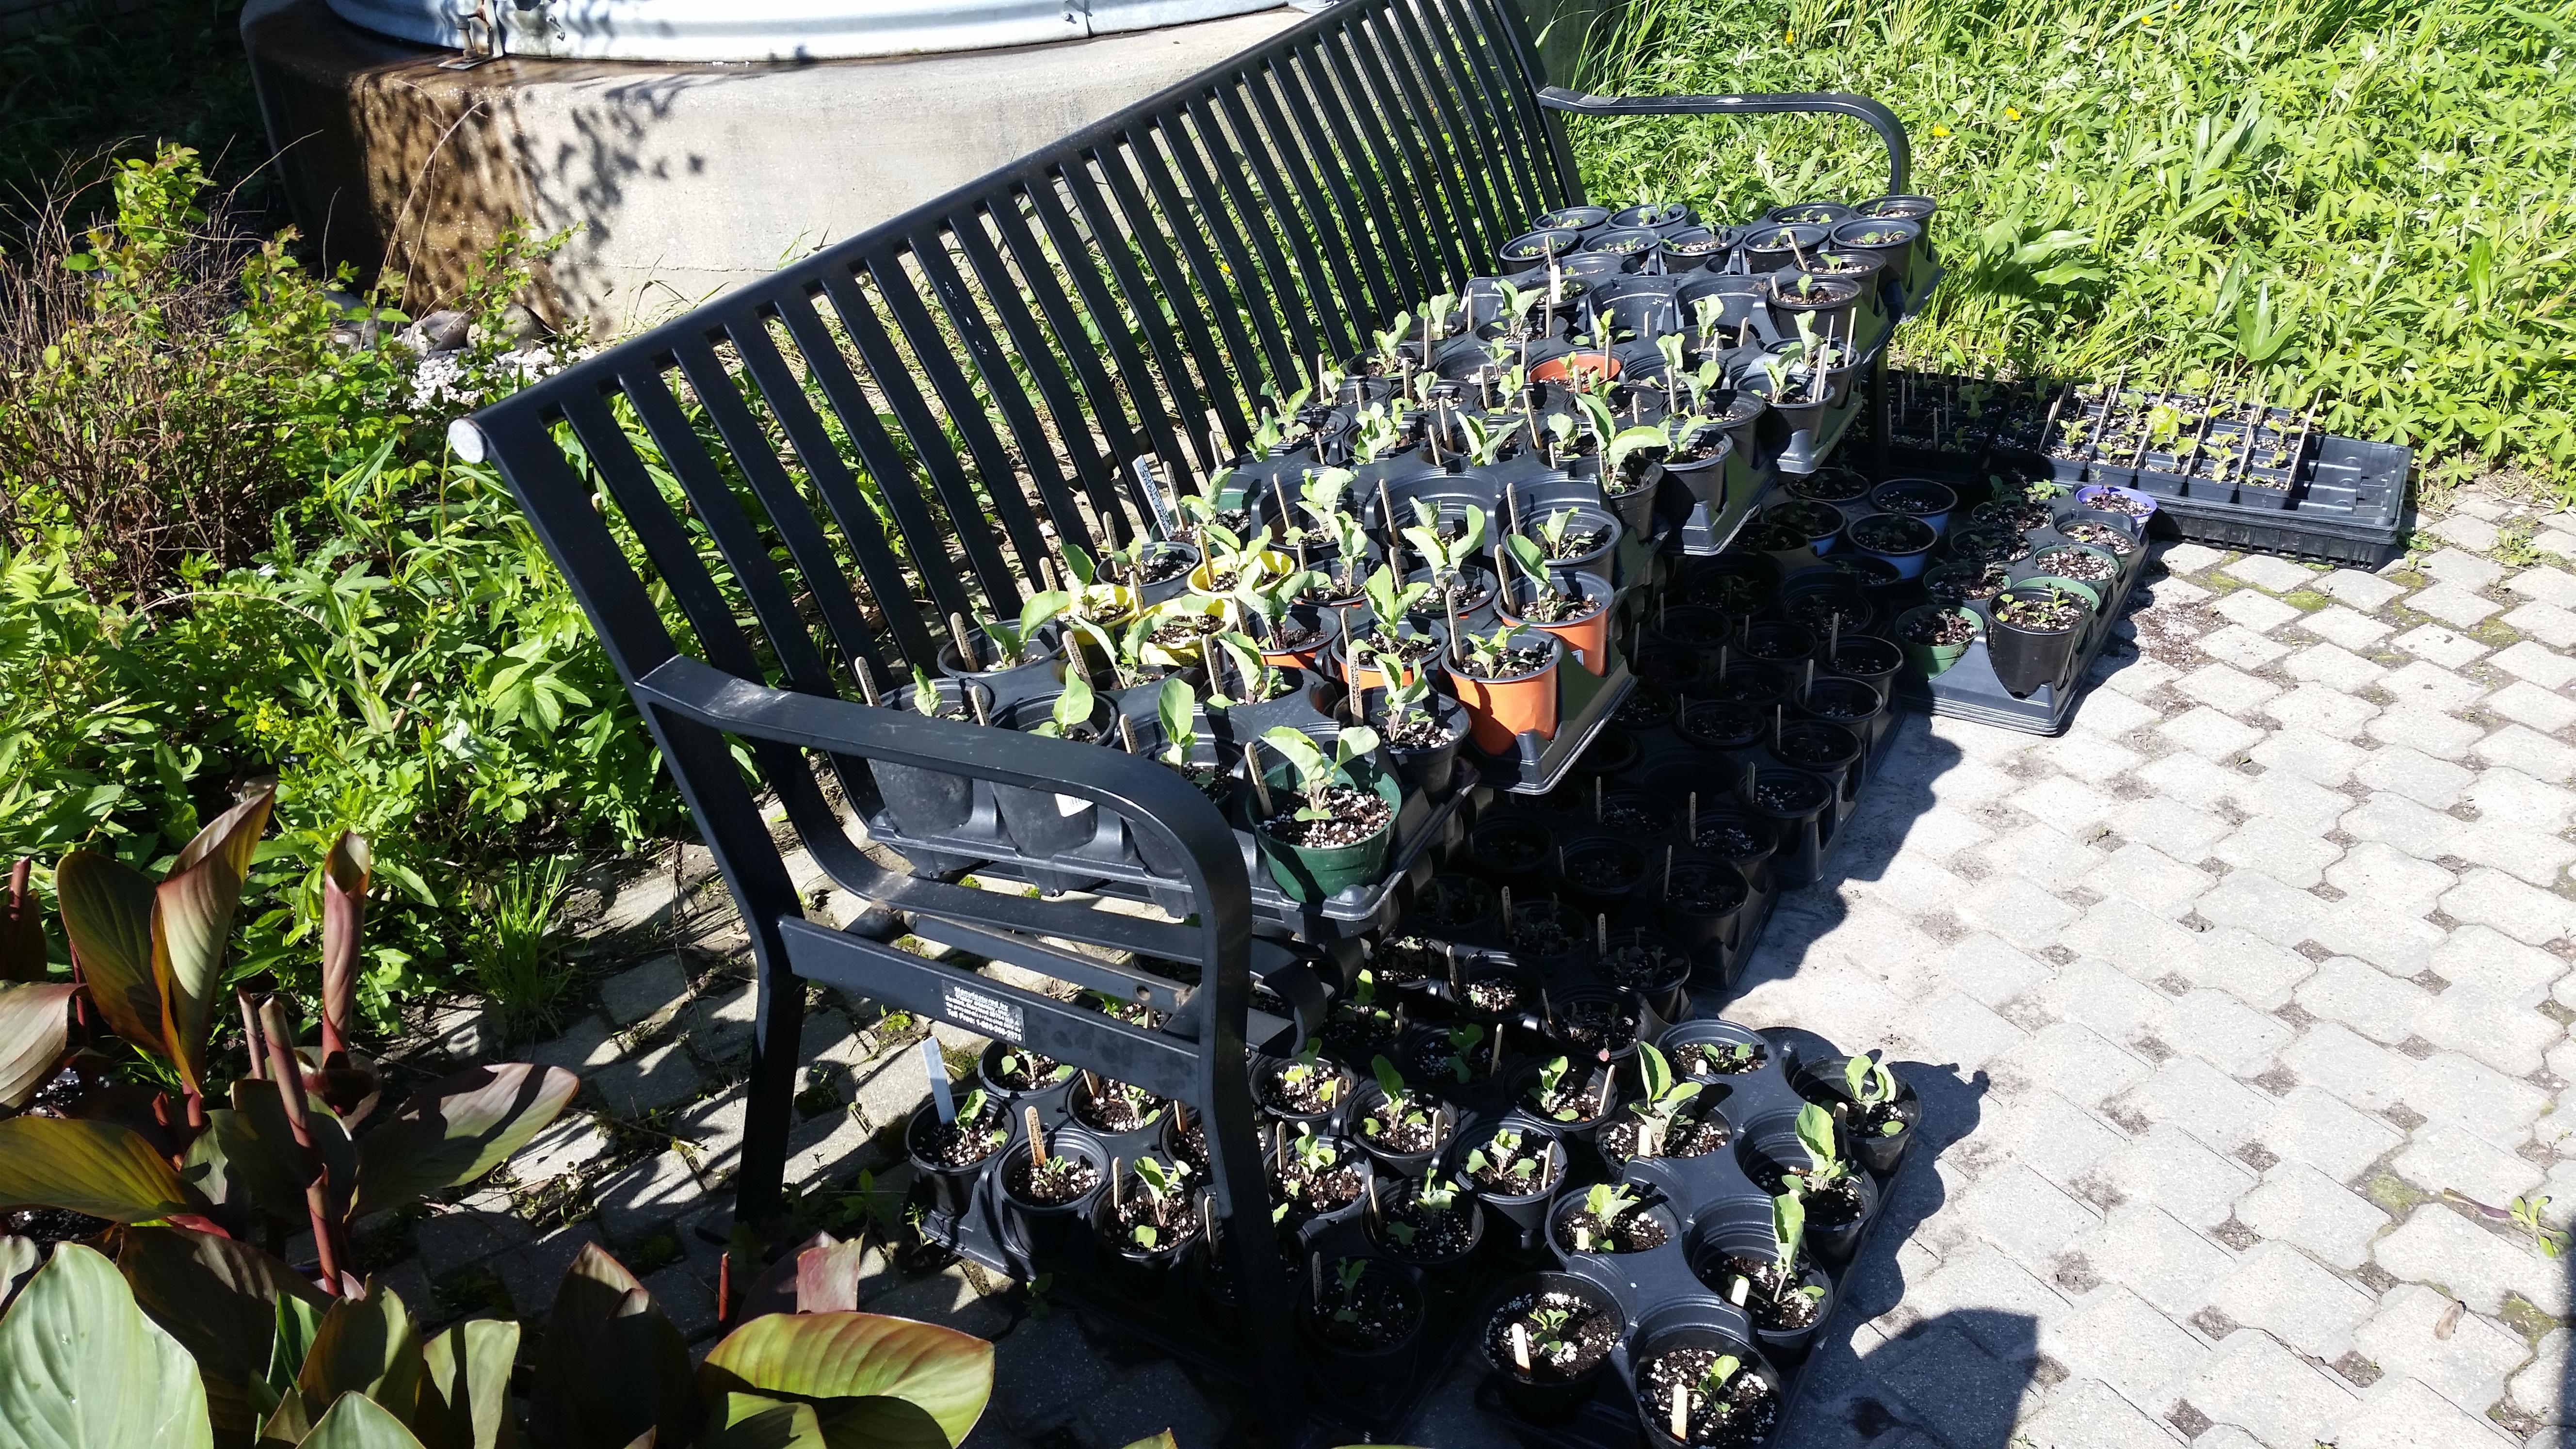 May 6th Distribution kale and eggplant